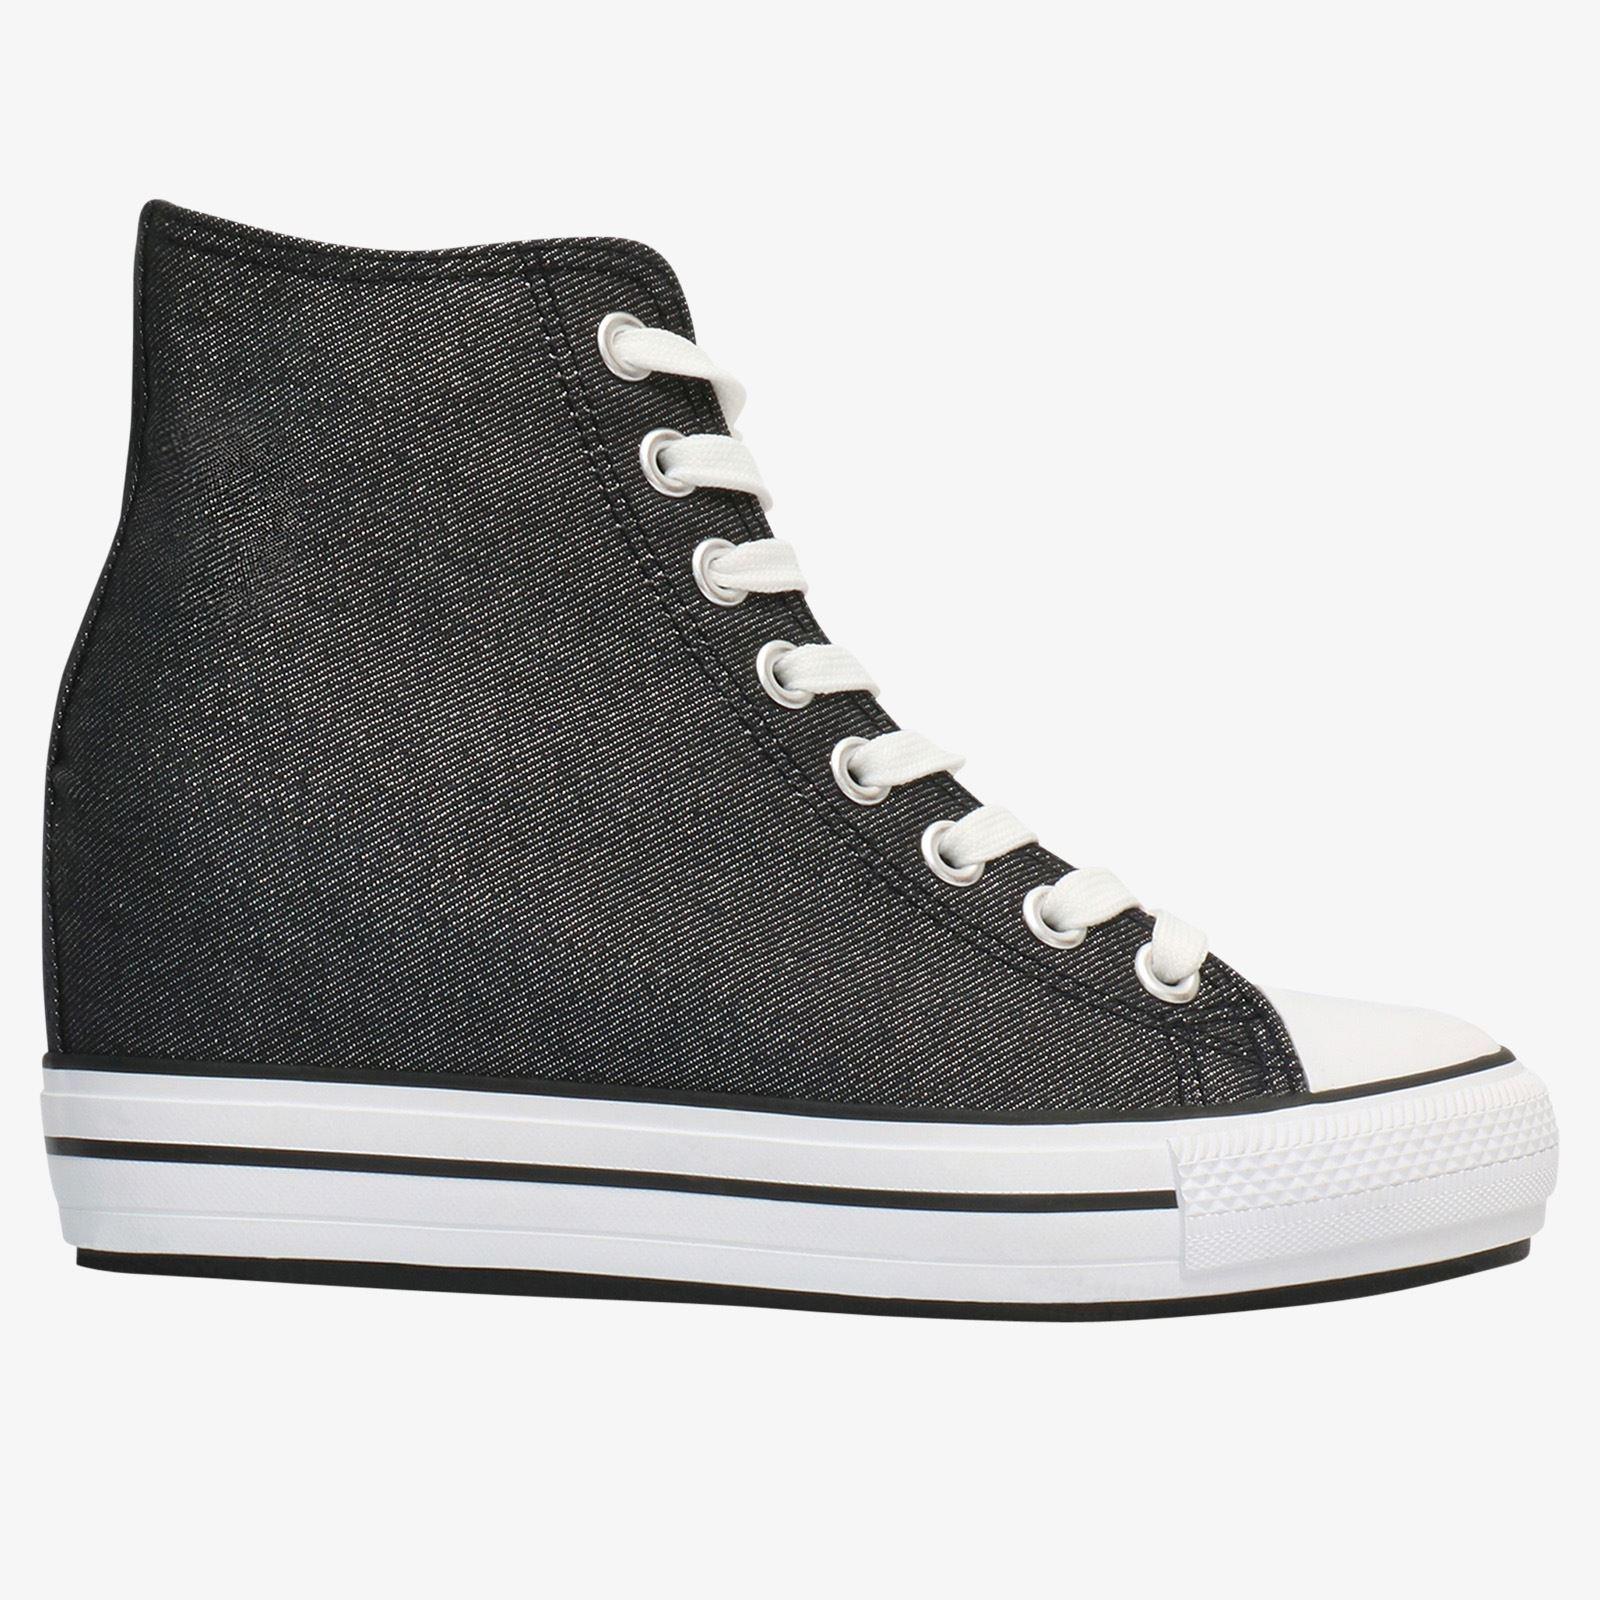 06dfc08da7 Damen Canvas Sneaker Versteckter Keilabsatz Plateau Schuh Designer Turnschuh